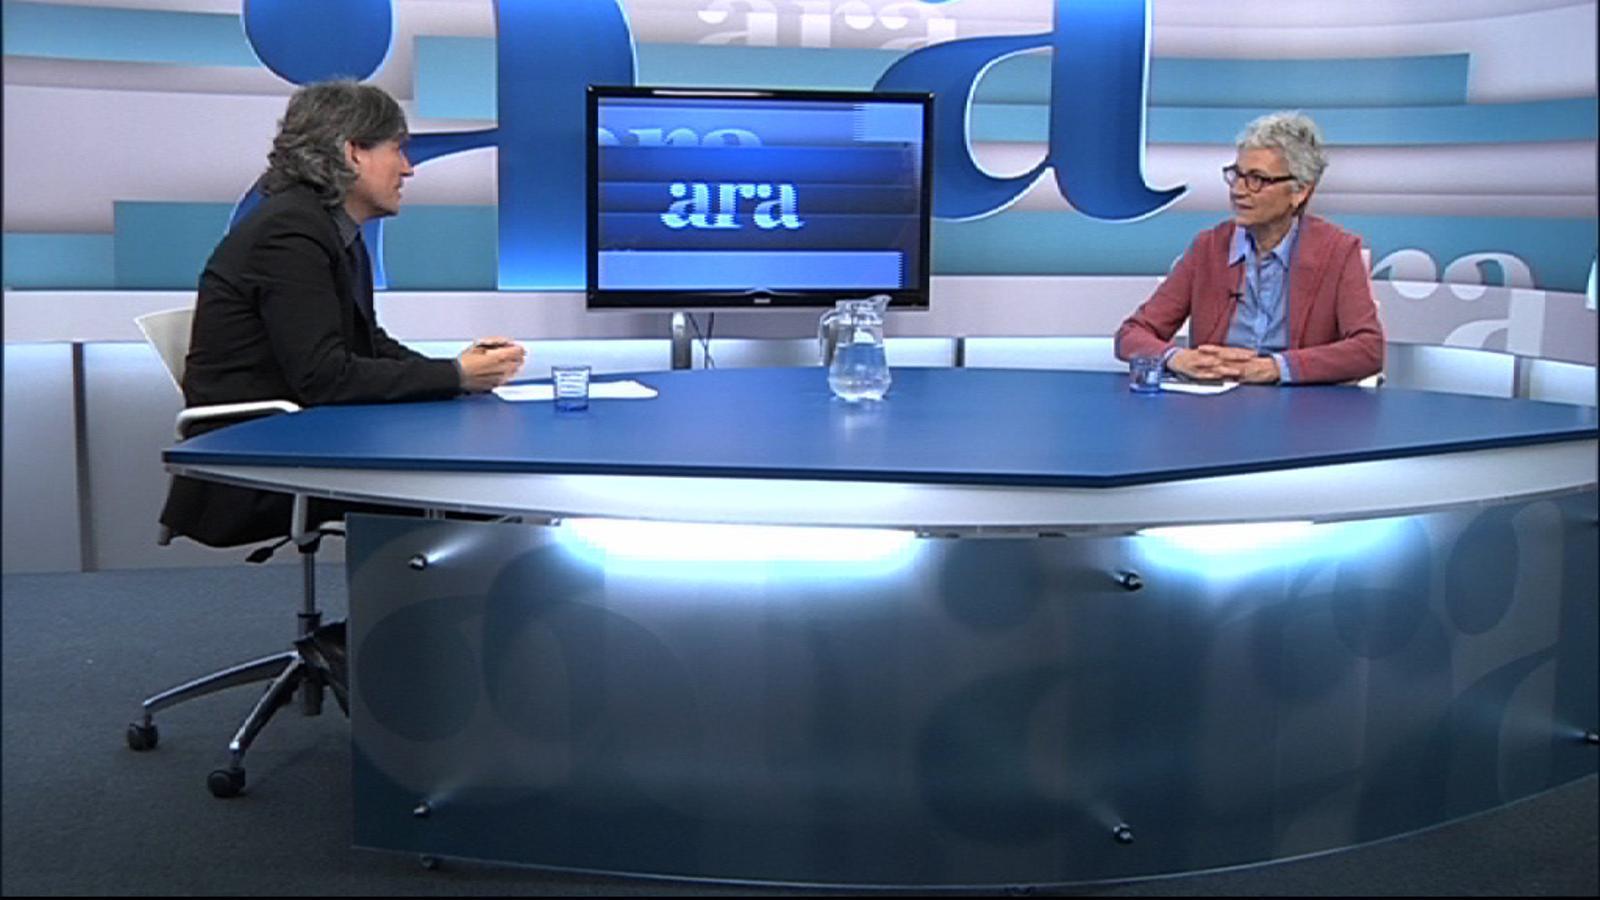 Entrevista sencera a Muriel Casals